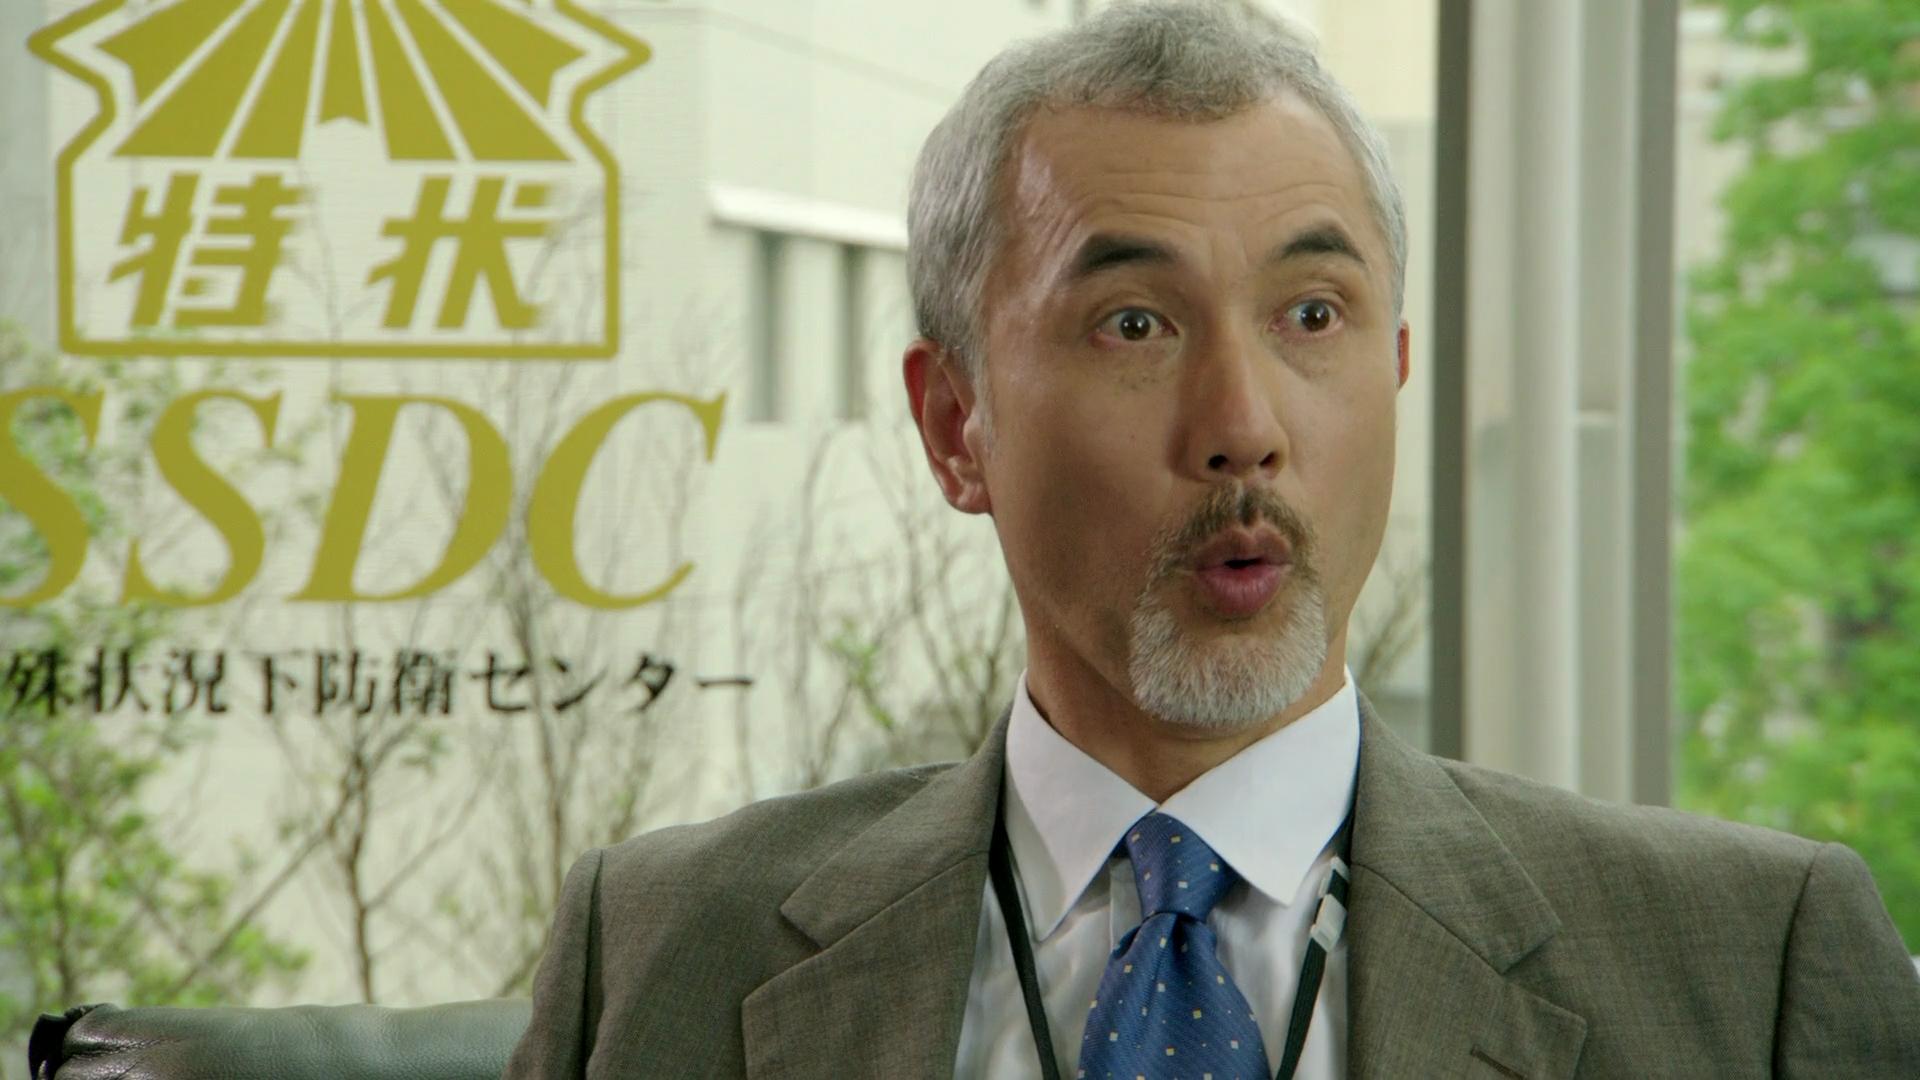 Akio Togama